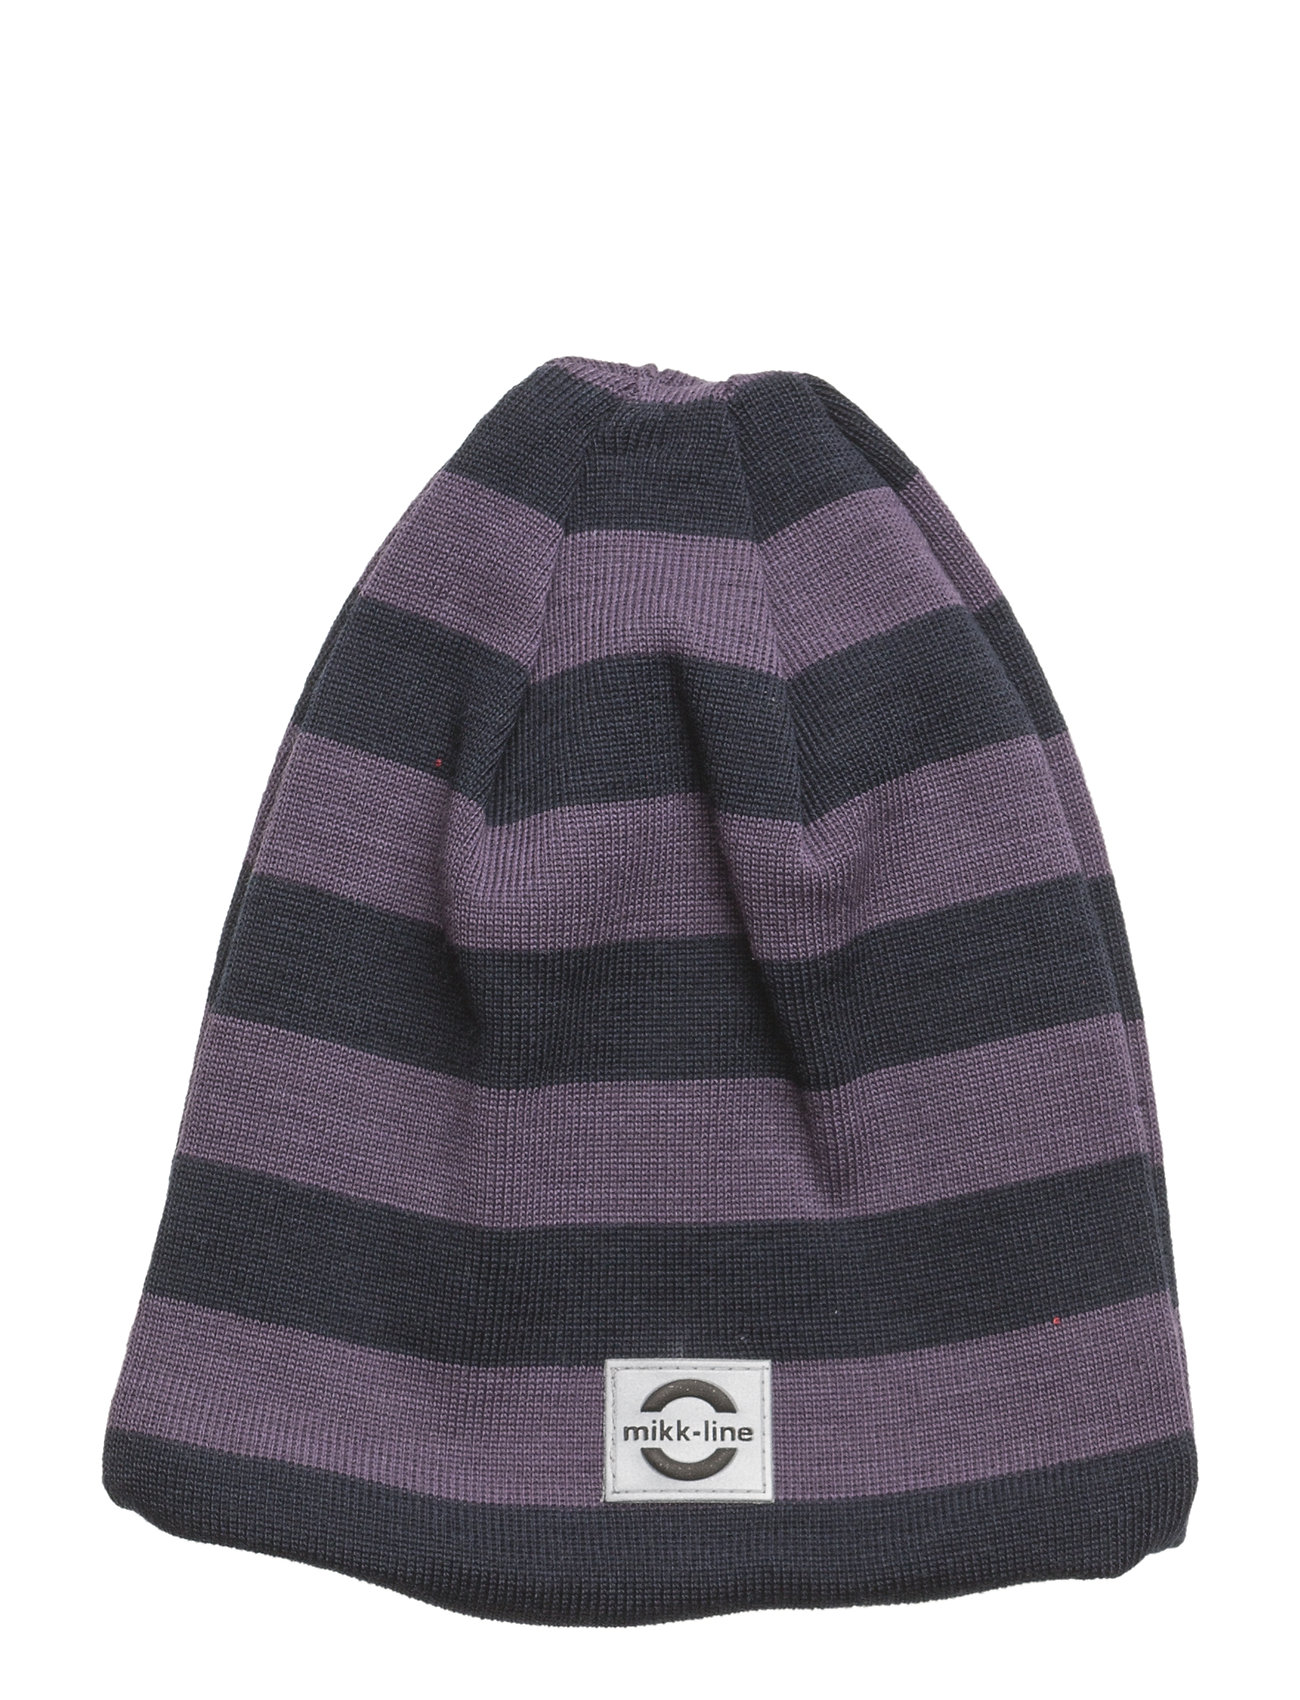 Mikk-Line WOOL hat - MONTANA GRAPE